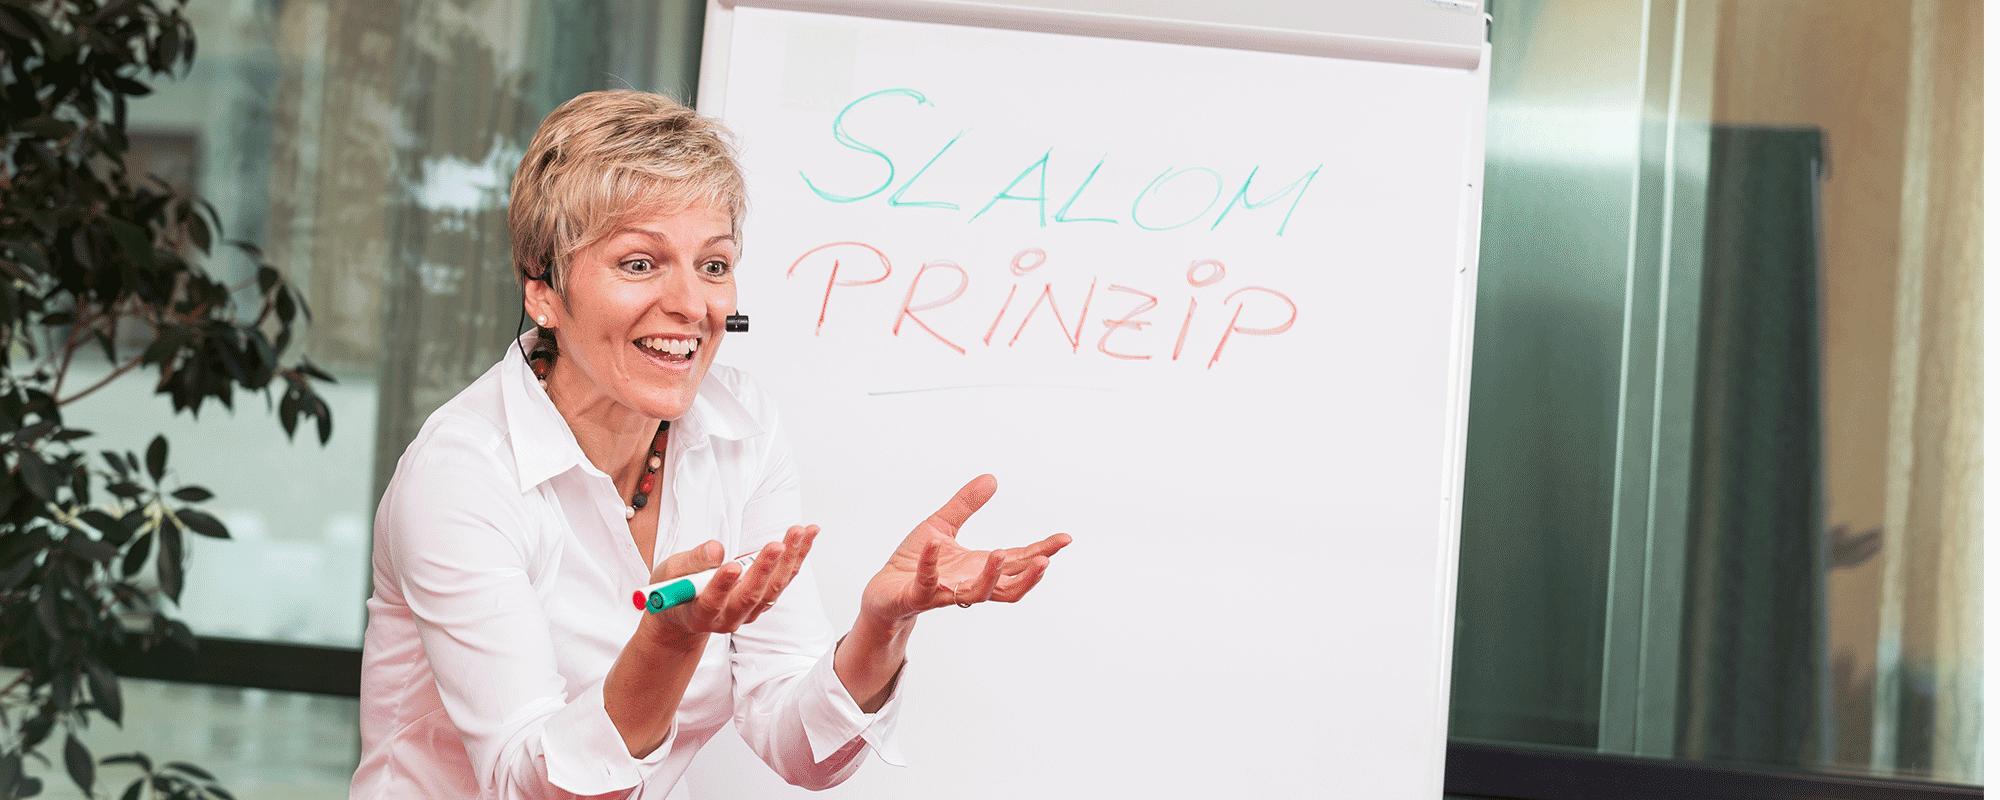 Claudia Strobl Speaker Erfolgstraining, Motivation, Erfolg, Glück, Lebensqualität, Coach